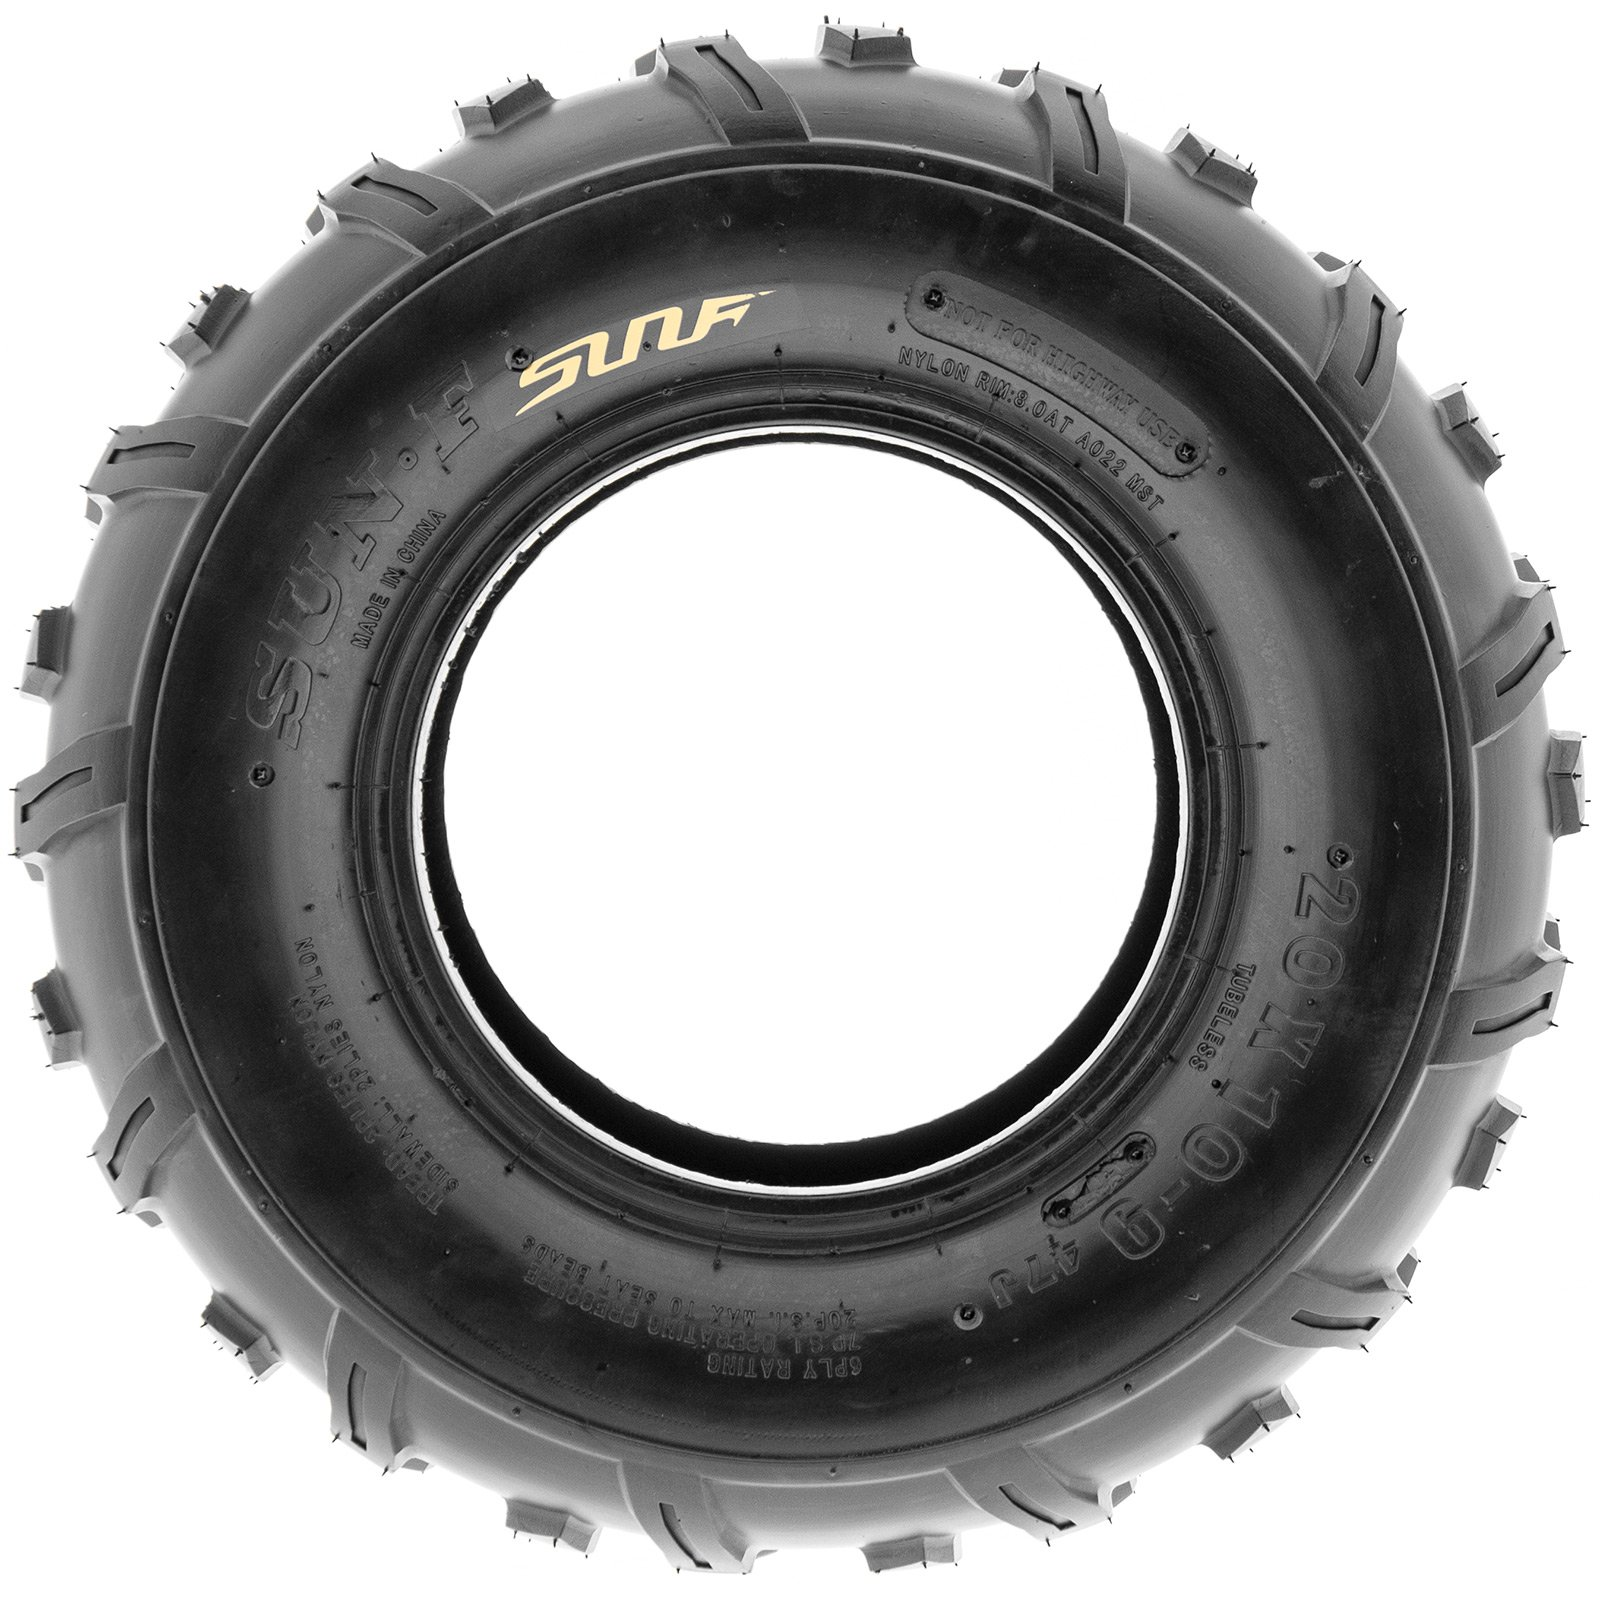 SunF Rear ATV Knobby Tires 20x10-9 20x10x9 4 PR A022 (Set pair of 2) by SunF (Image #4)